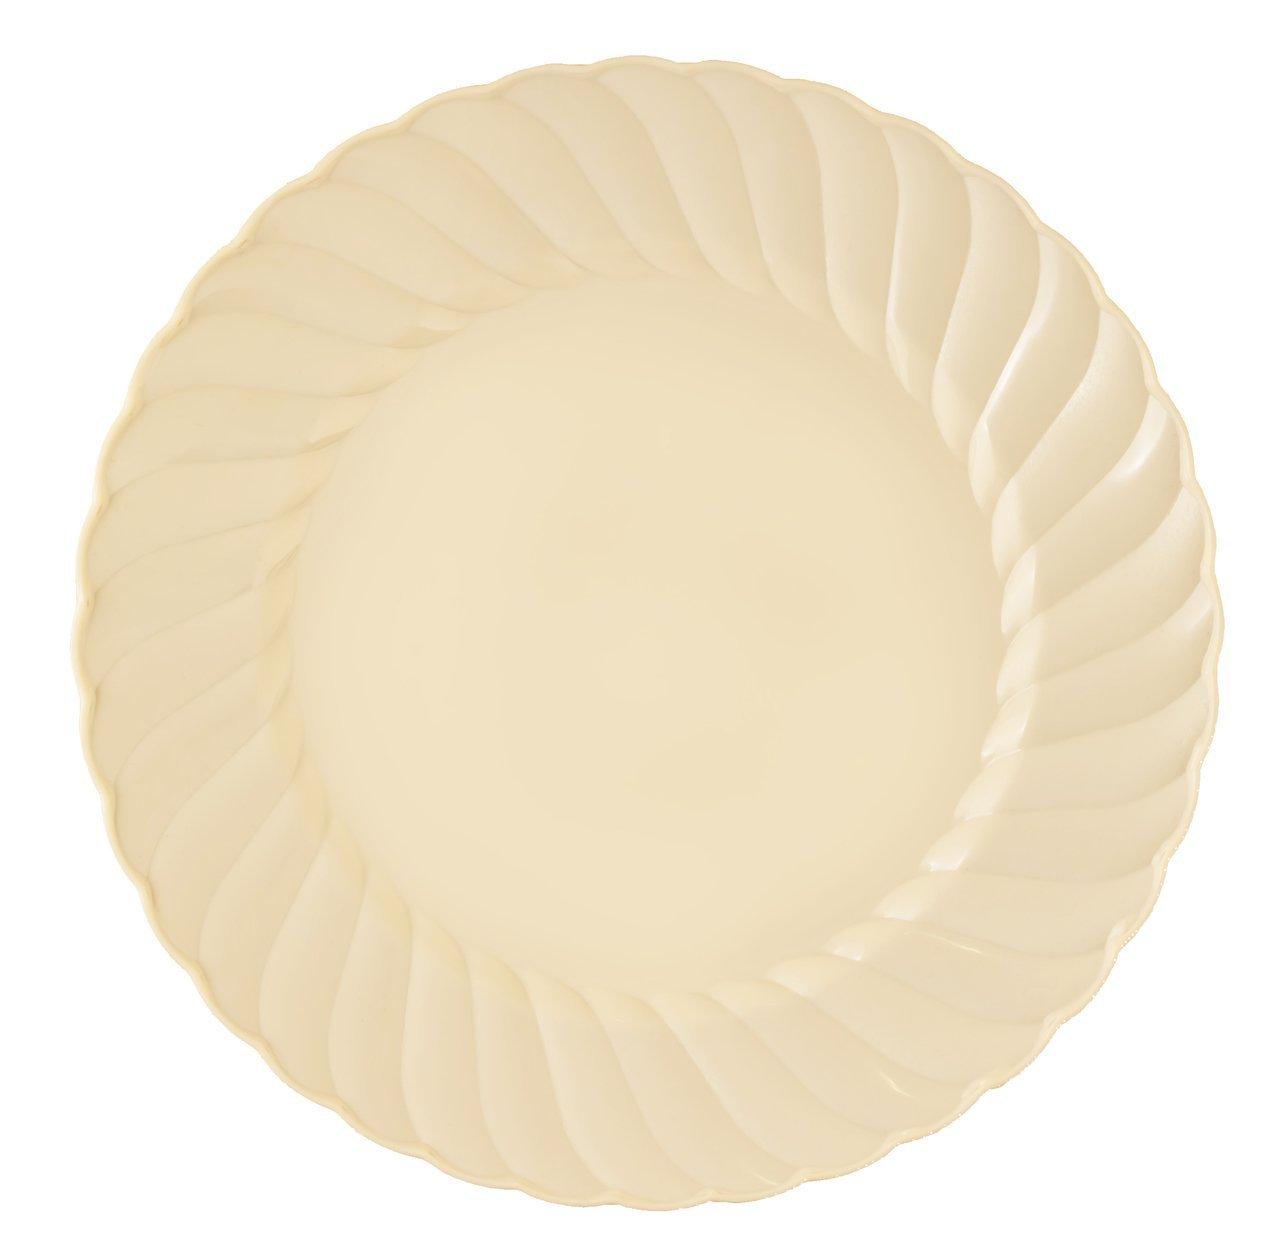 Kaya Collection - Disposable Bone Plastic Round 7.5'' Salad/Dessert Plates - 2 Pack (36 Plates)